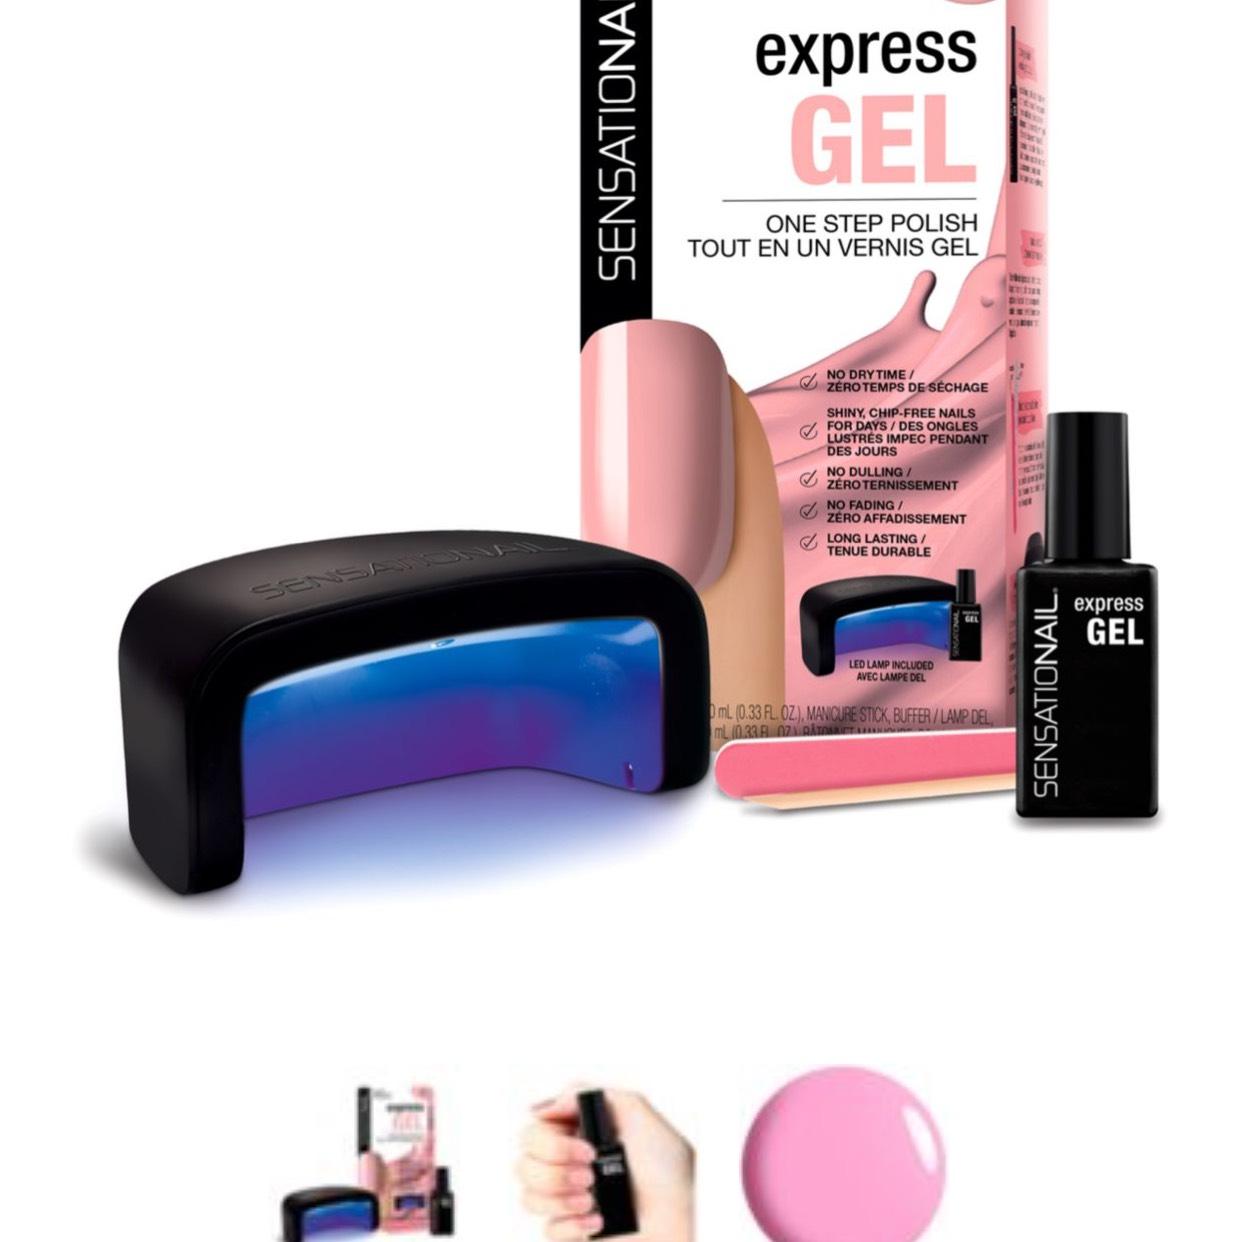 SensatioNail Express Starter Kit - Made Him Blush (Nail kit with uv lamp gel nails) was £34.99 now £24.99 @ Boots